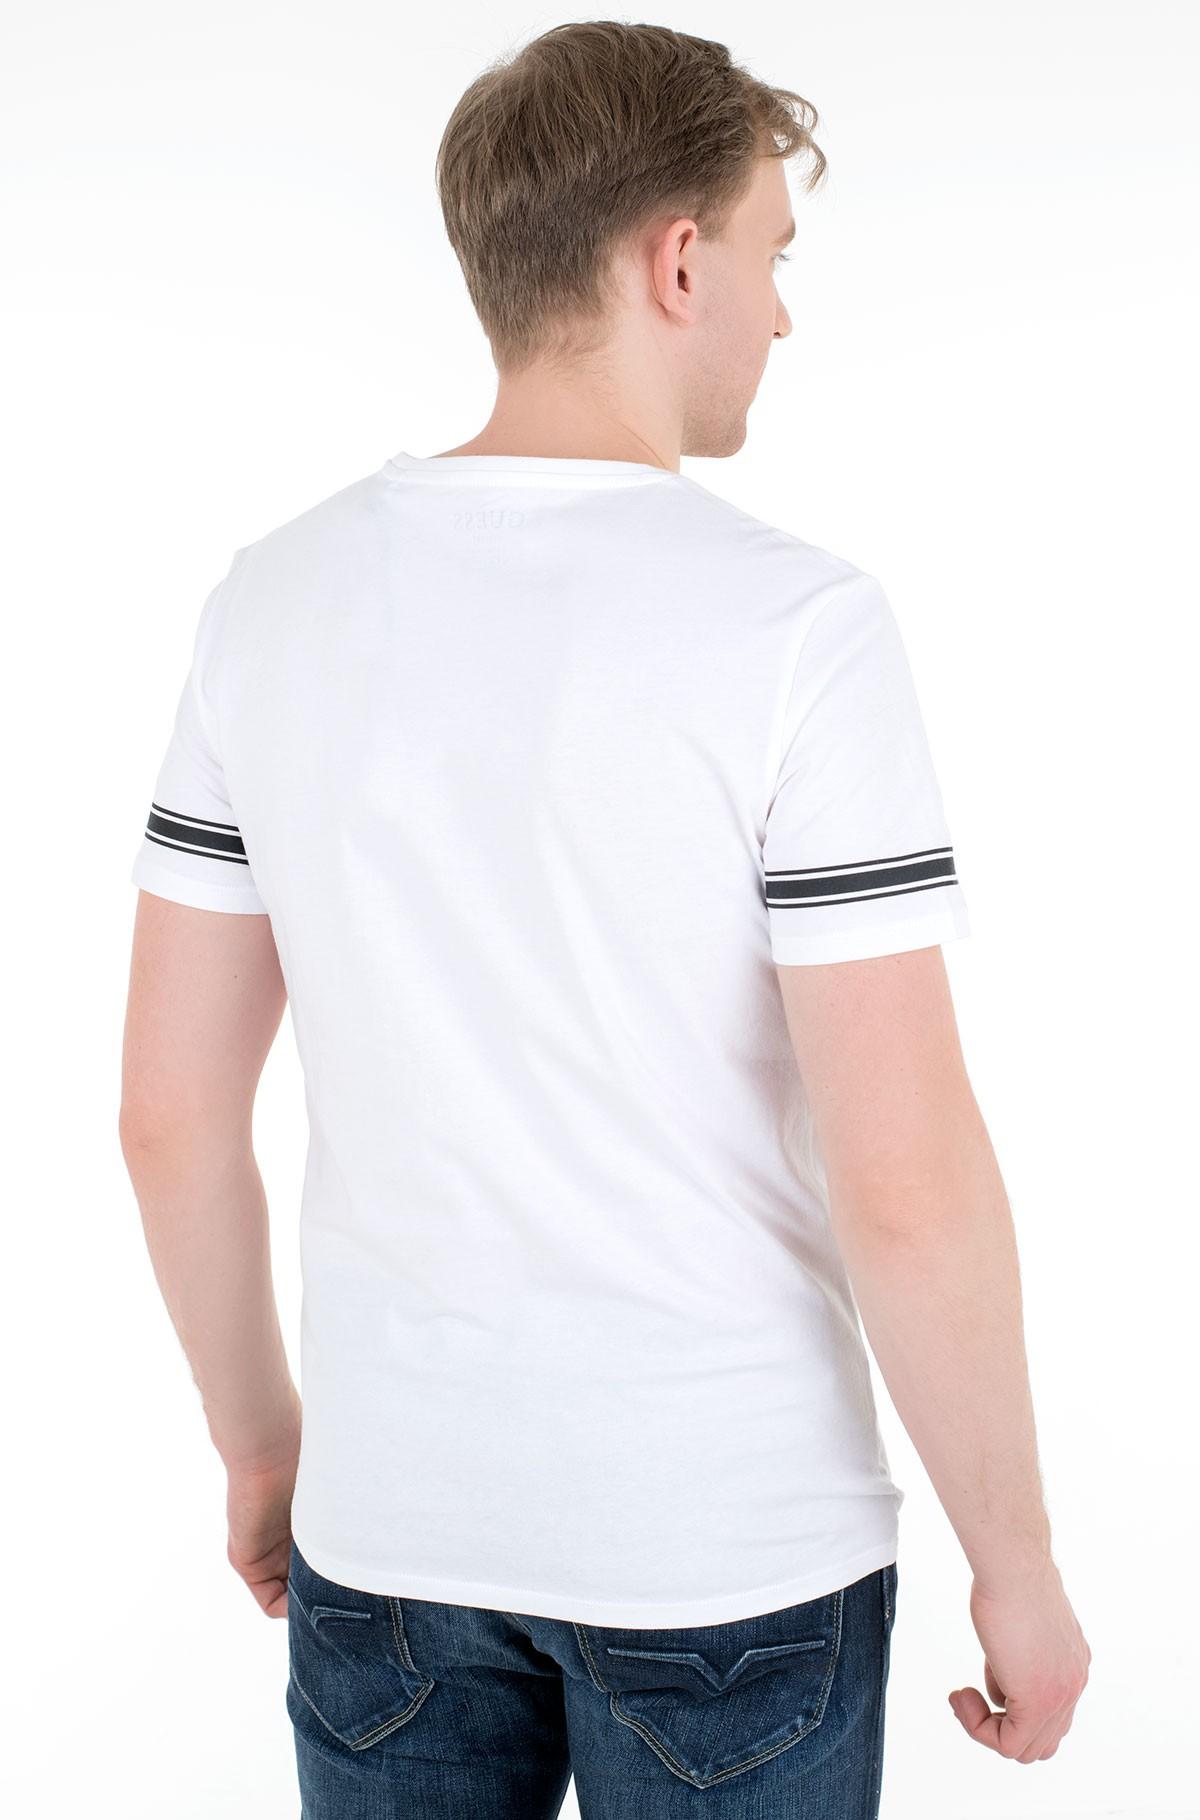 T-shirt M1RI56 K8HM0-full-2